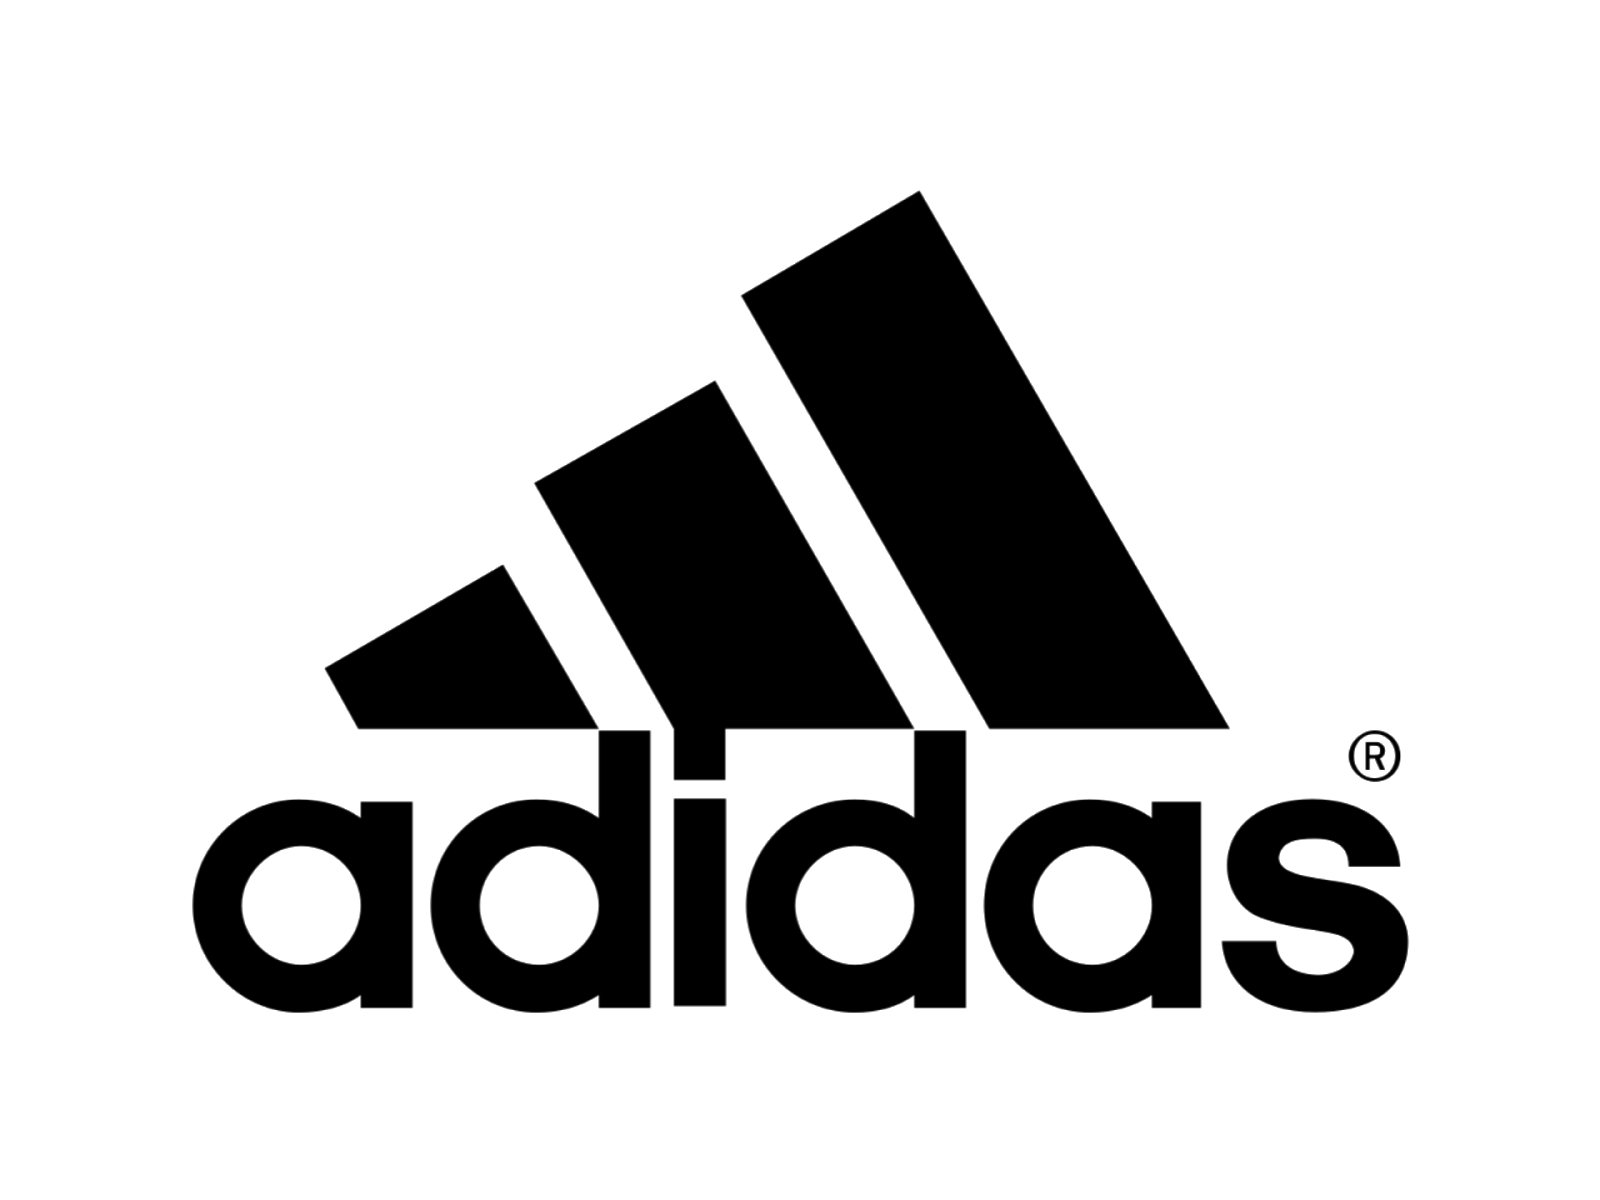 Logo Adidas Format PNG